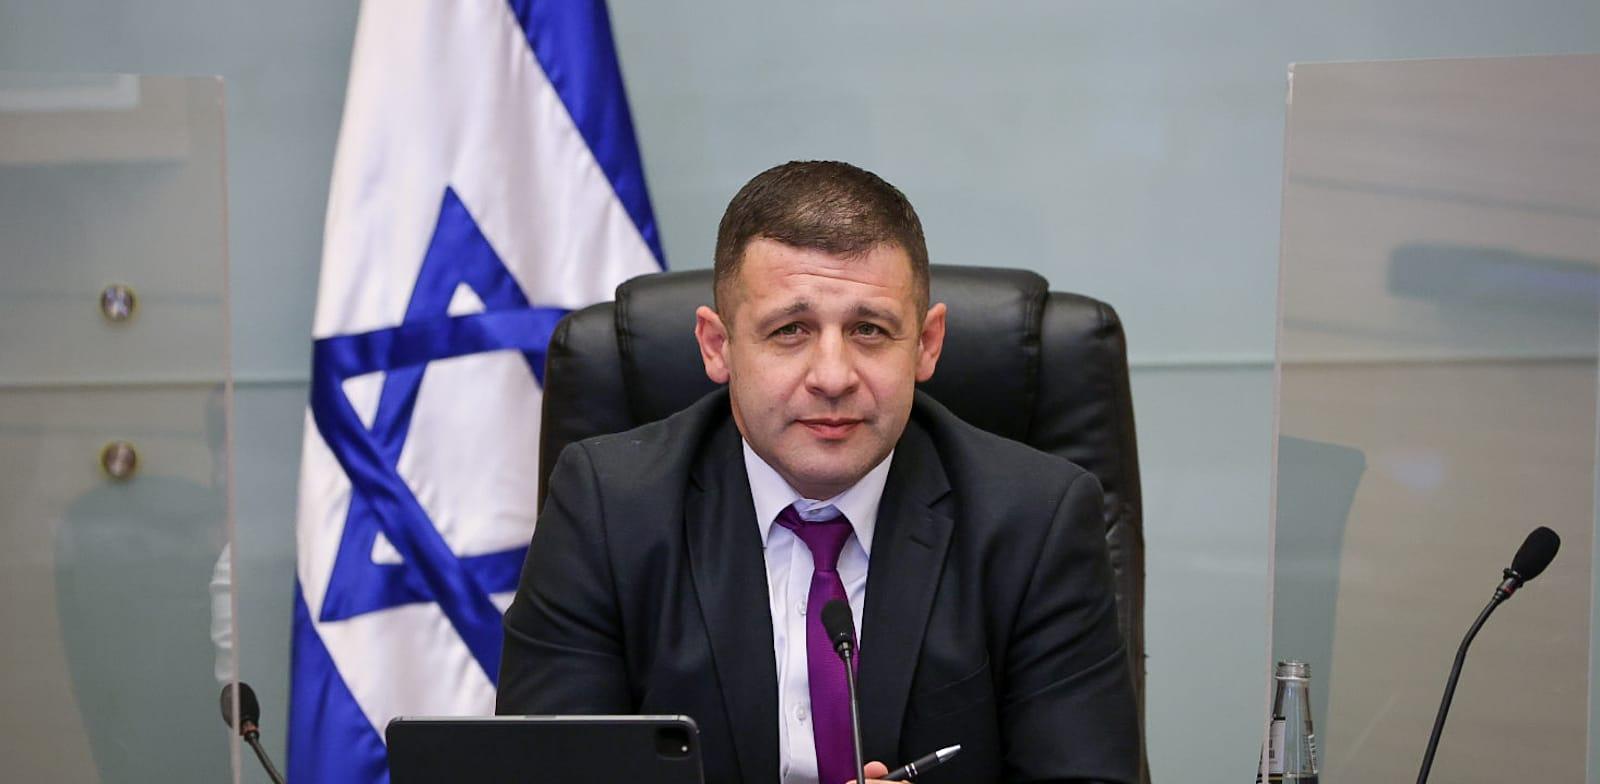 Alex Kushnir Photo: Knesset Spokesperson Noam Moskovich